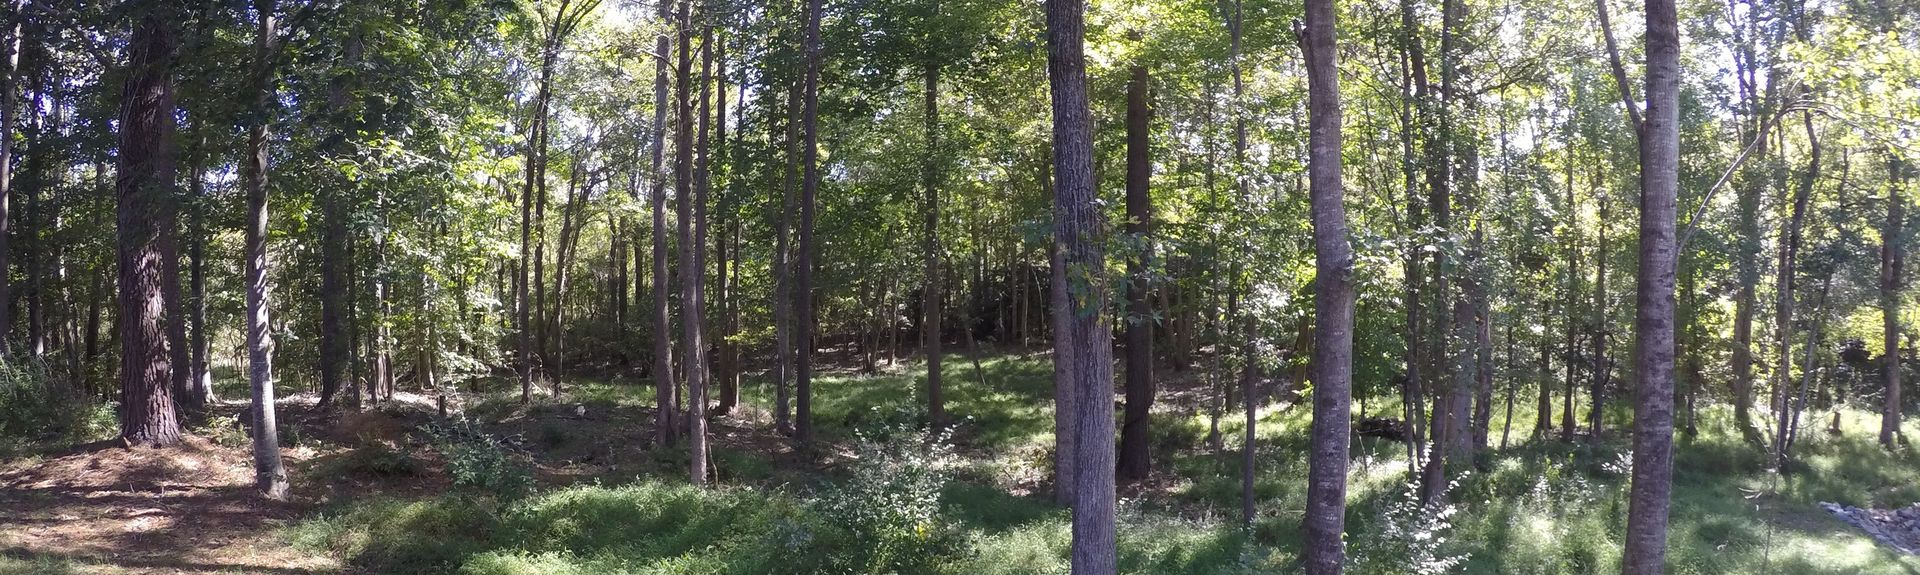 Youngsville, Carolina do Norte, Estados Unidos